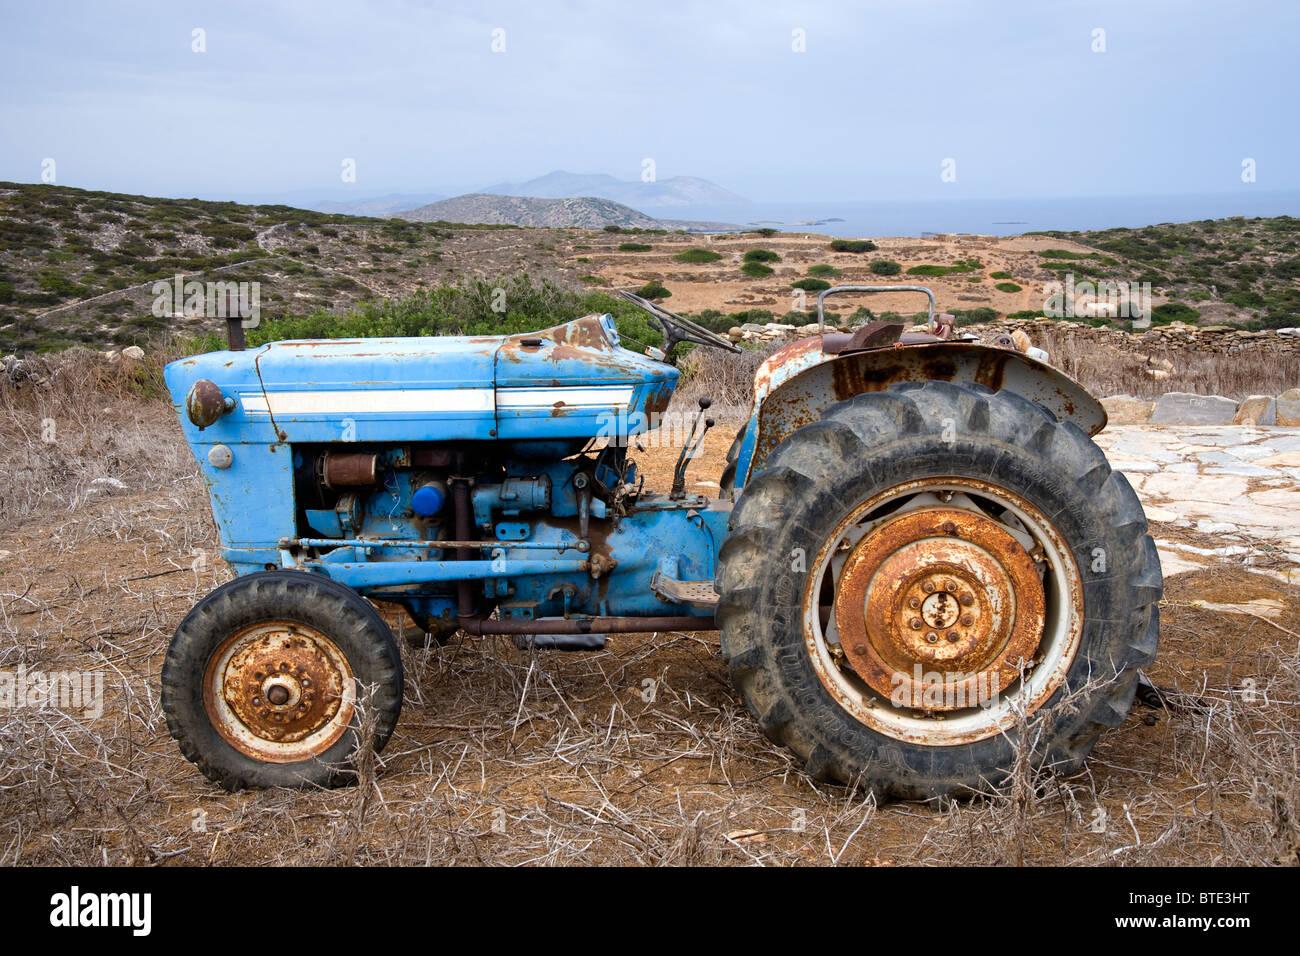 Old Ford Farm Tractors : Old ford farm tractor in a field taken near arkesini